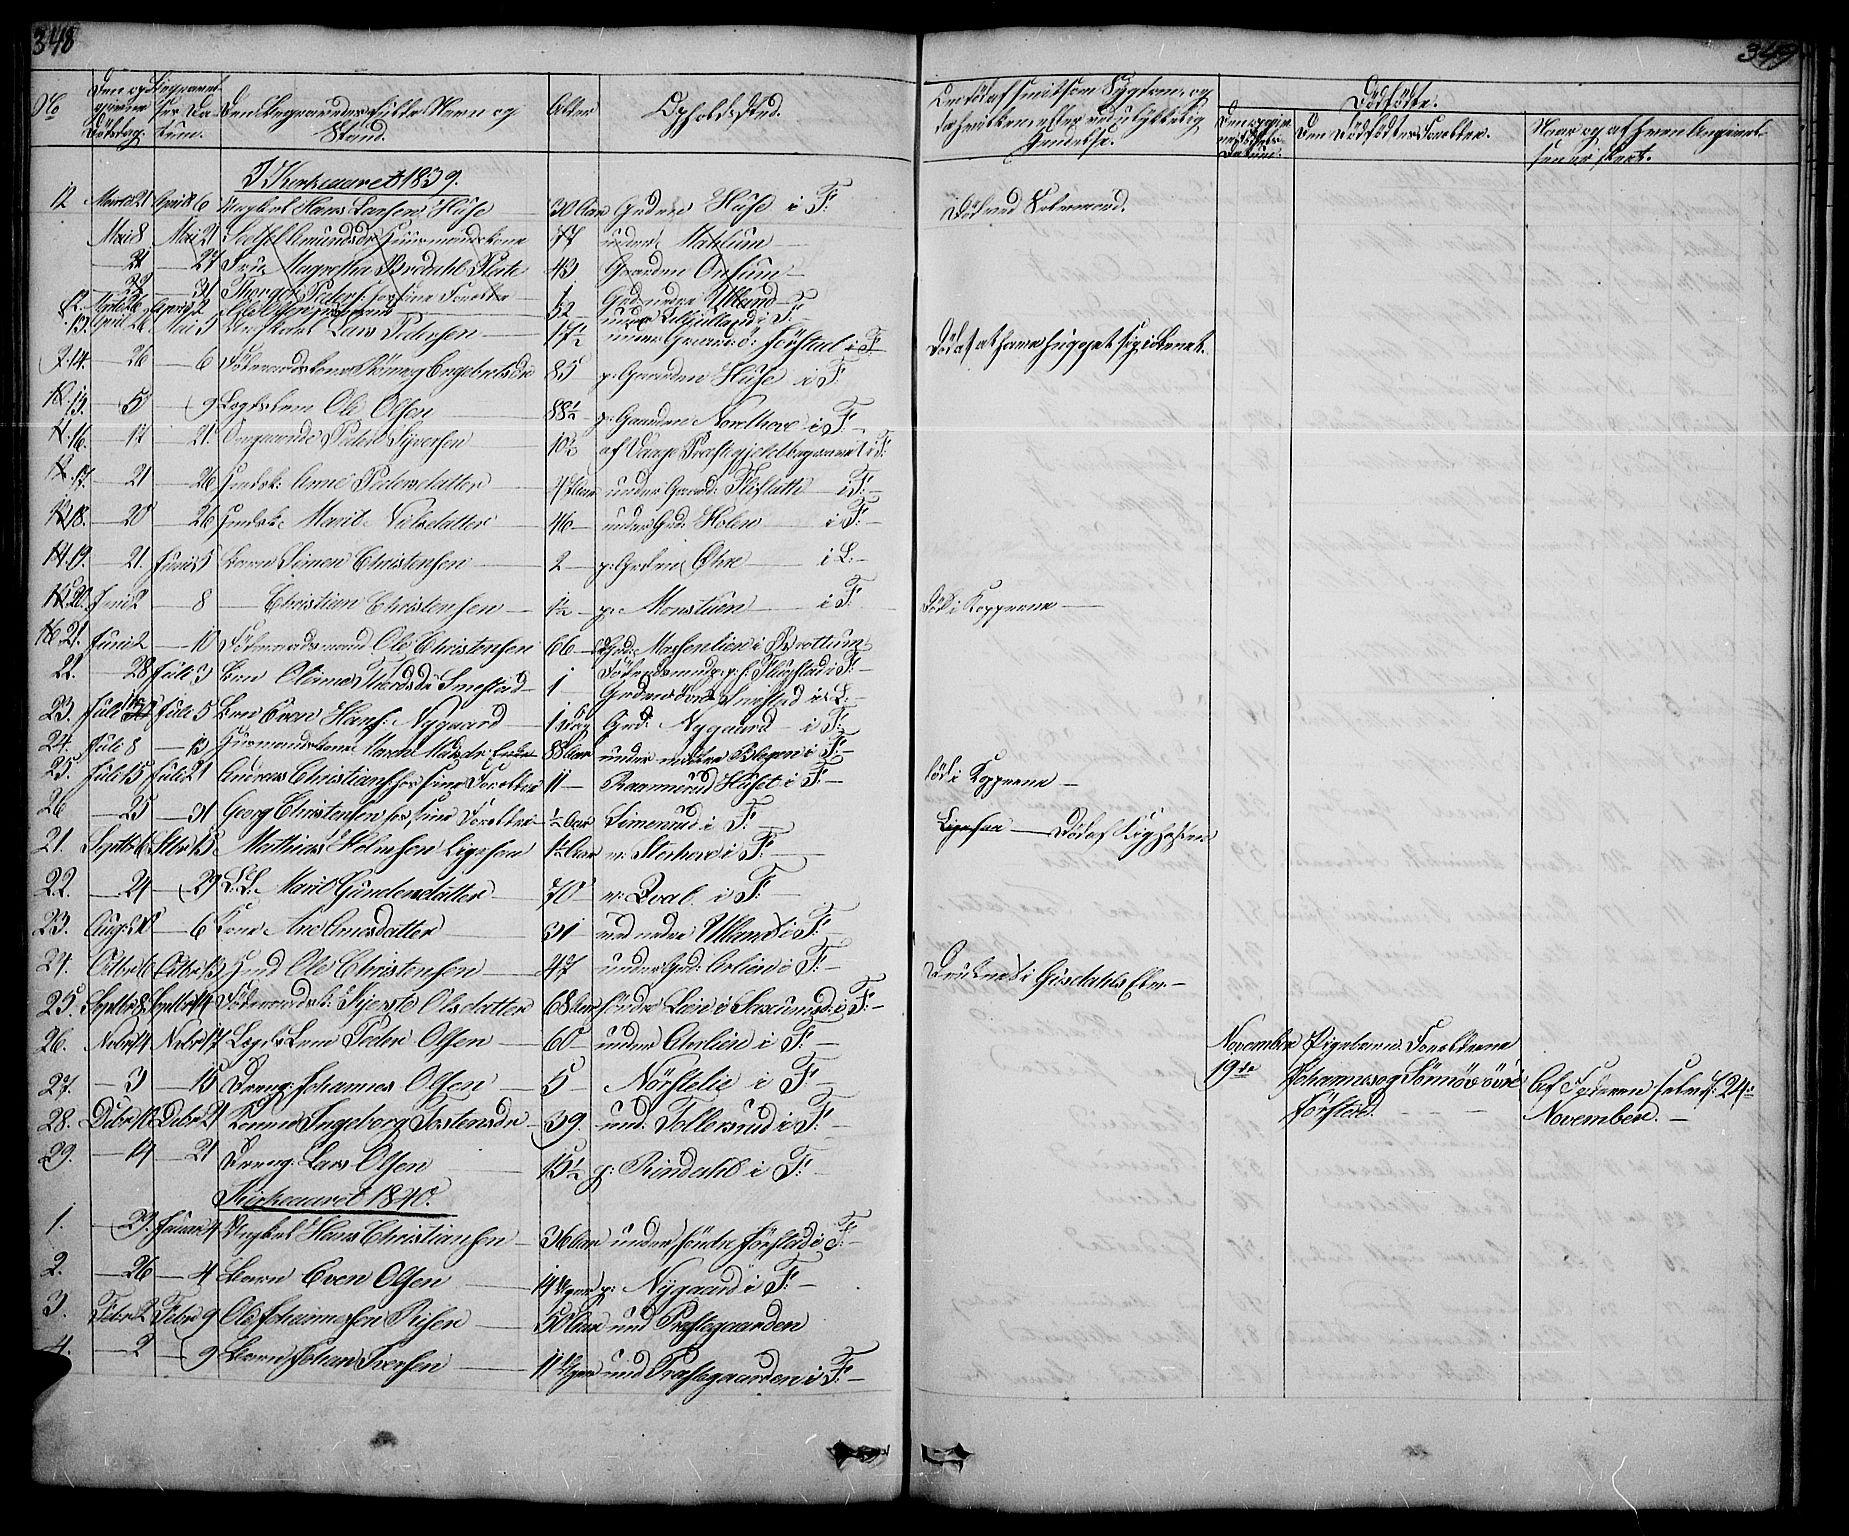 SAH, Fåberg prestekontor, Klokkerbok nr. 5, 1837-1864, s. 348-349